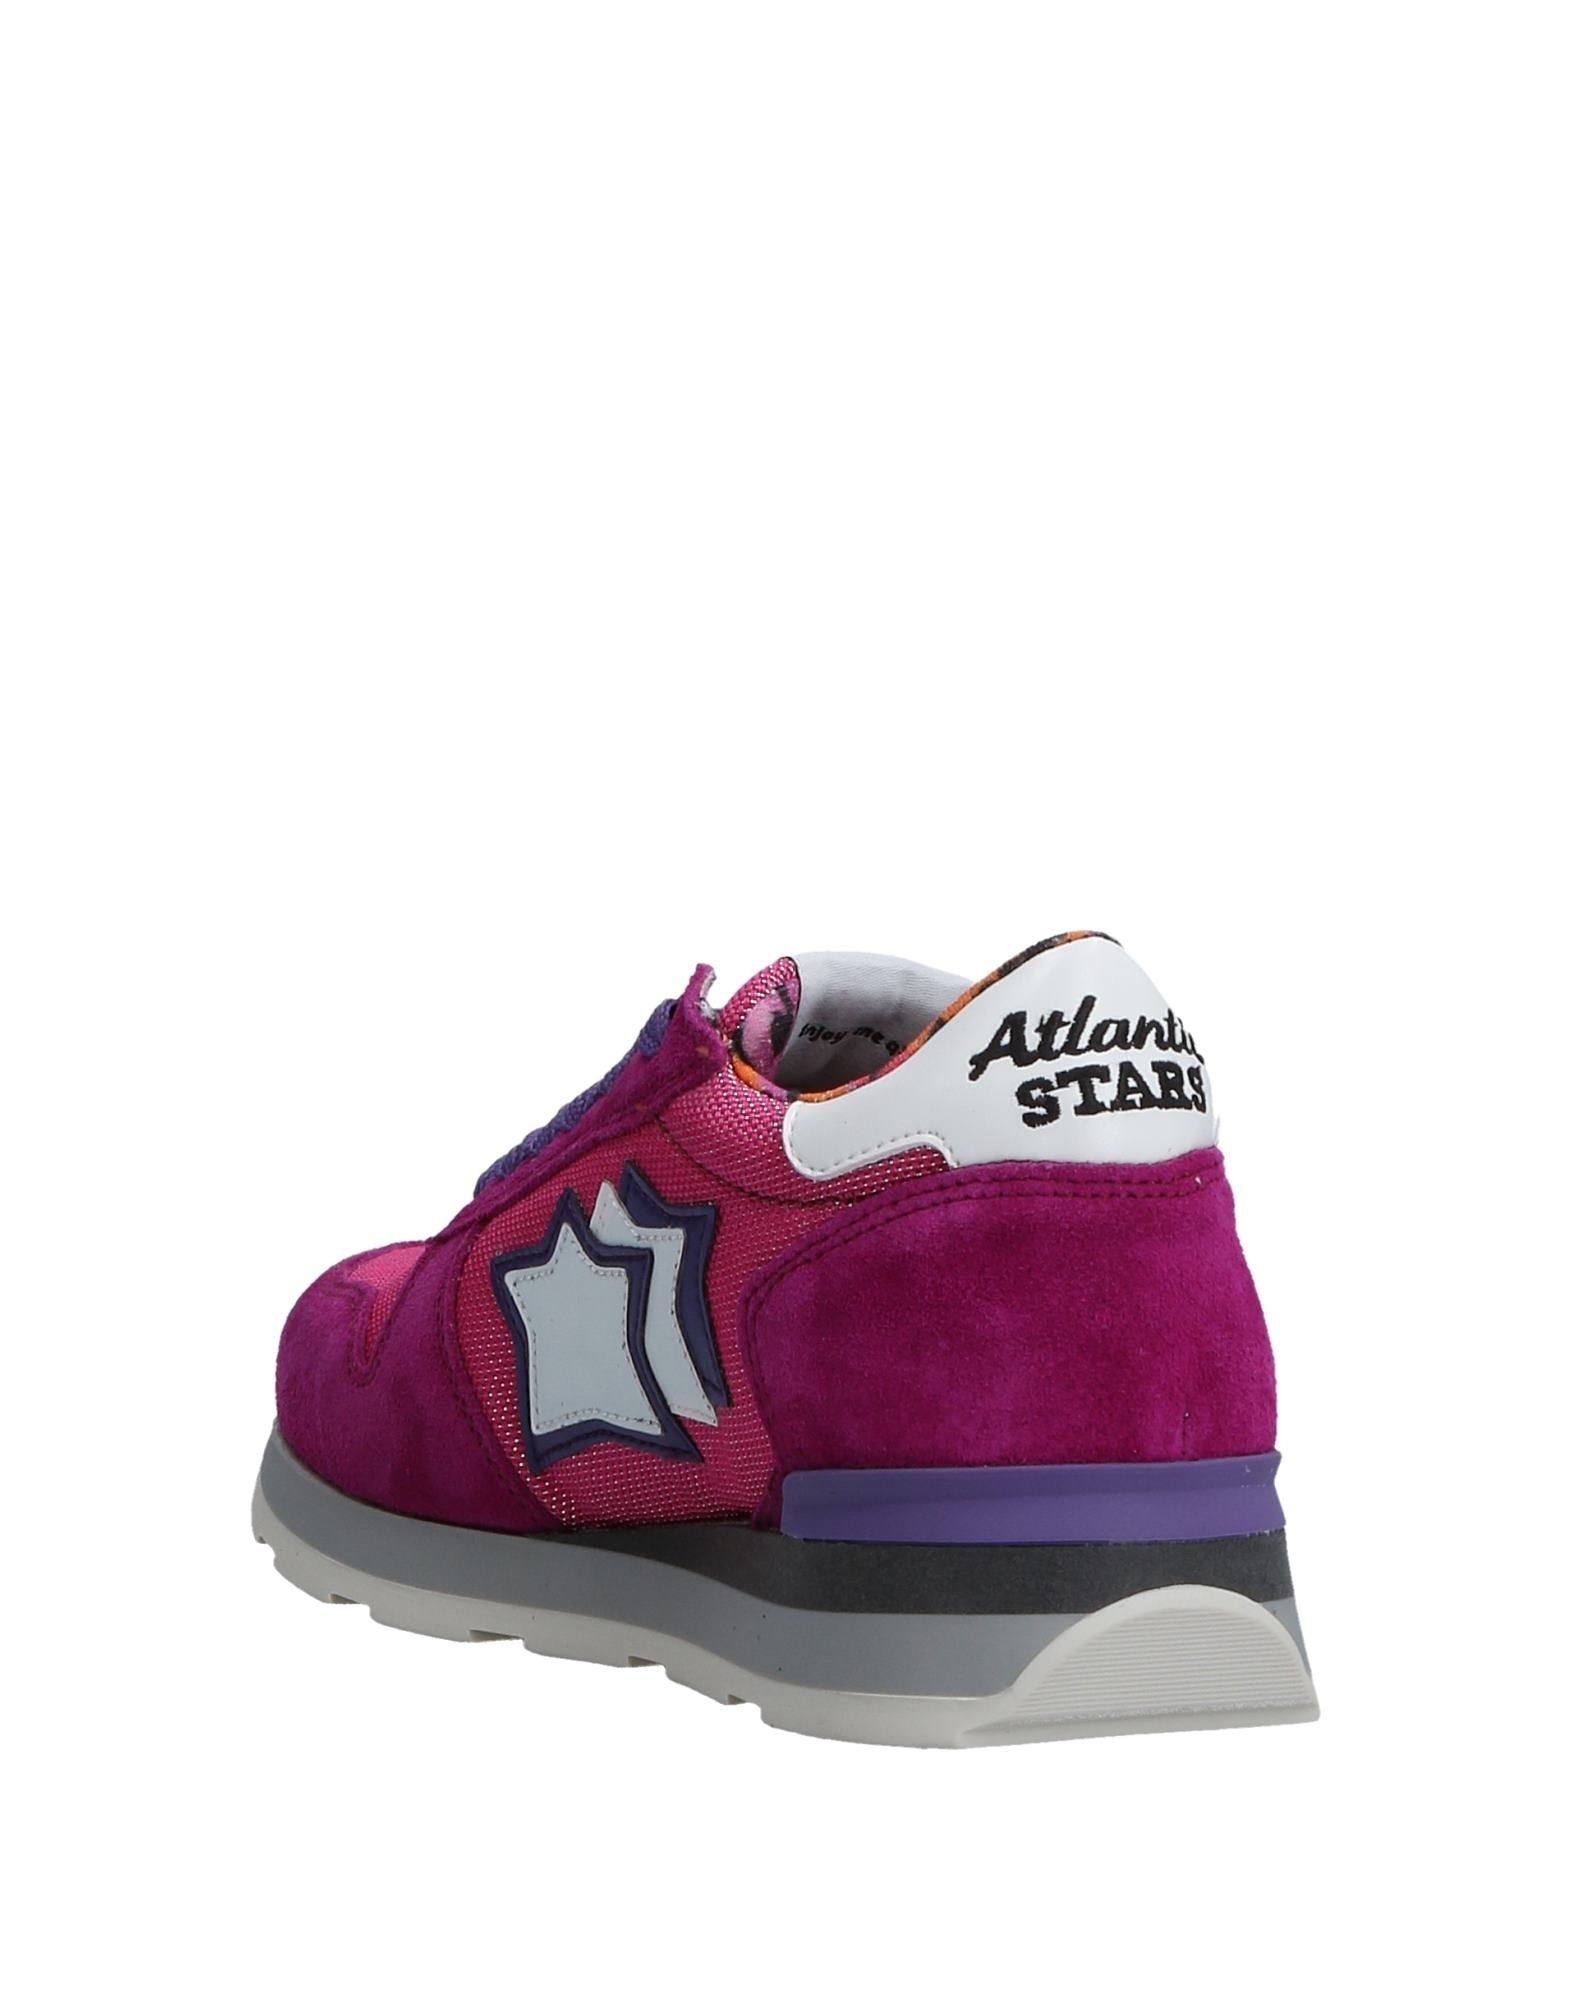 Atlantic Stars Sneakers Damen  11524757RI Gute Qualität beliebte Schuhe